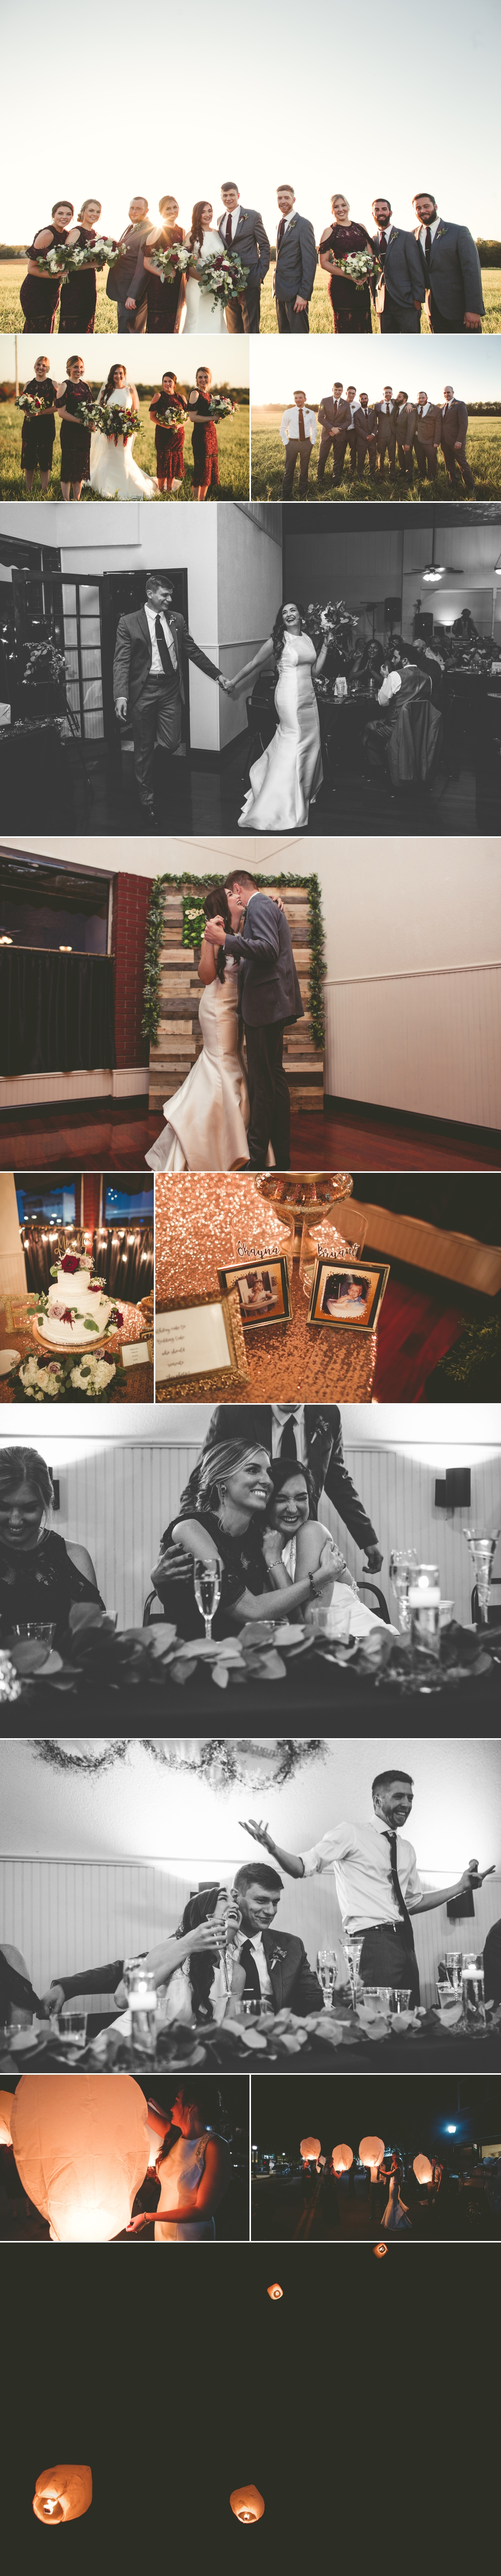 jason_domingues_photography_best_kansas_city_wedding_photographer_kc_weddings_tonganoxie_ks_brunswick_ballroom_0003.JPG